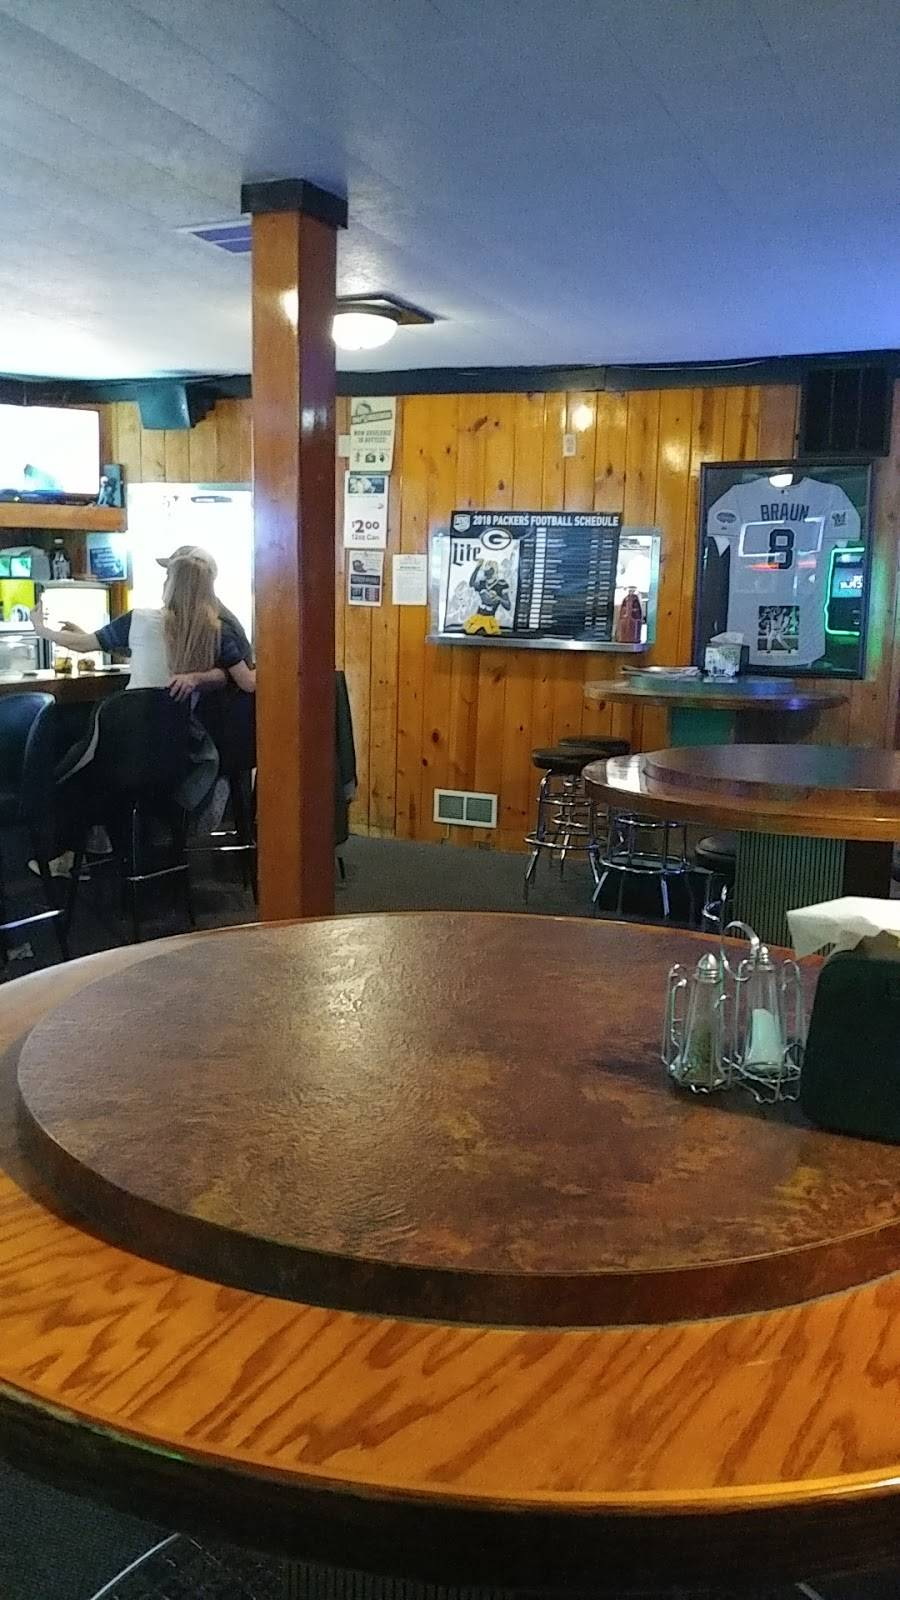 Bears Sports Bar   restaurant   214 N Milwaukee St, Theresa, WI 53091, USA   9202762104 OR +1 920-276-2104